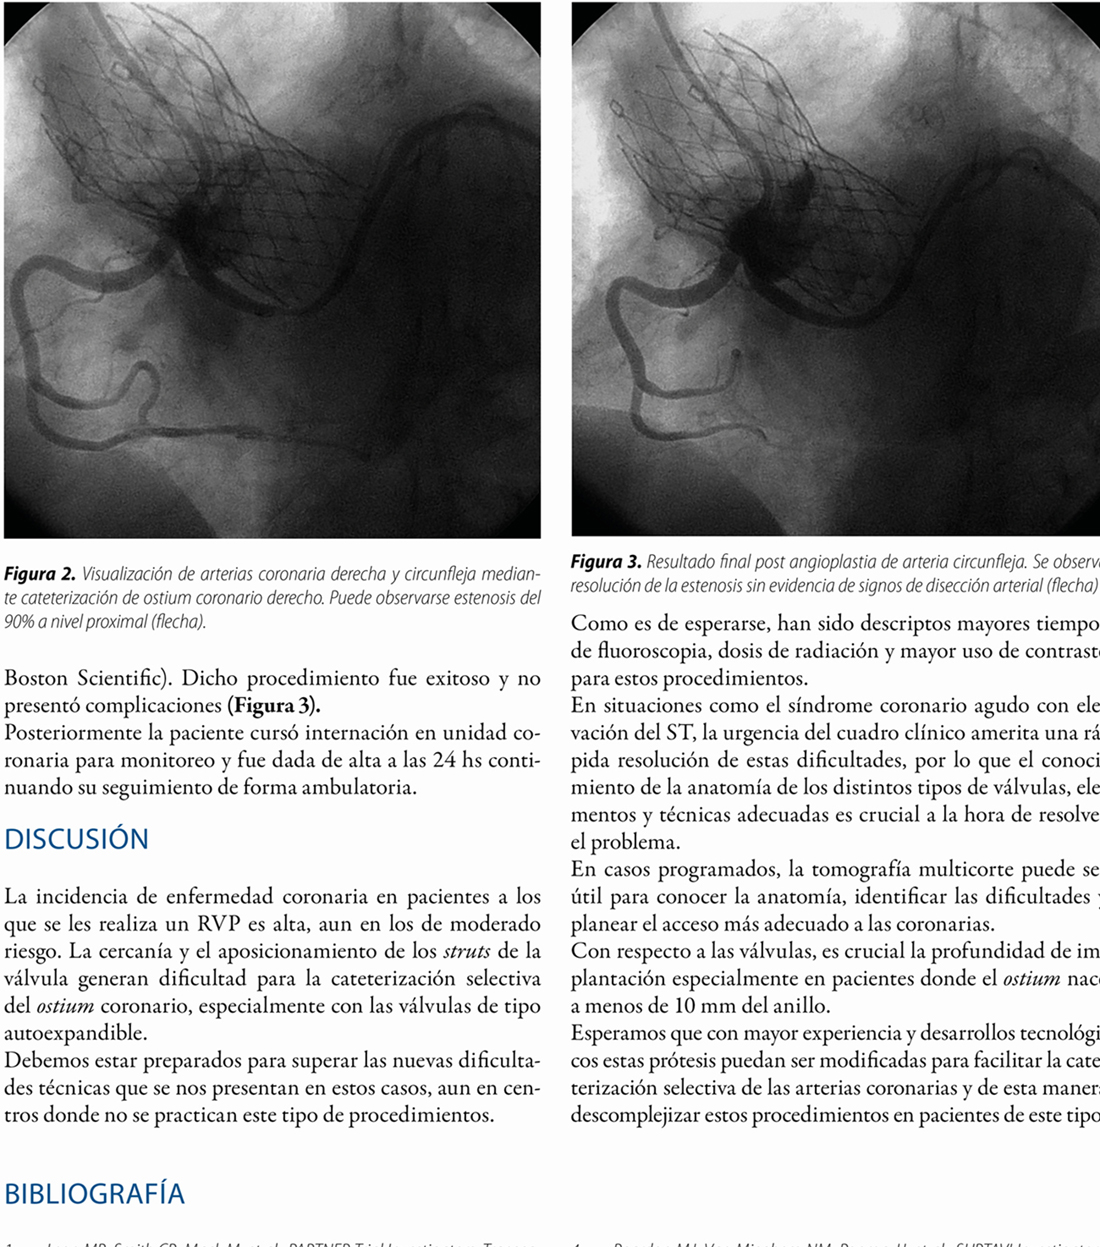 Angioplastia coronaria en arteria circunfleja con nacimiento anómalo en paciente con implante previo de válvula aórtica percutánea